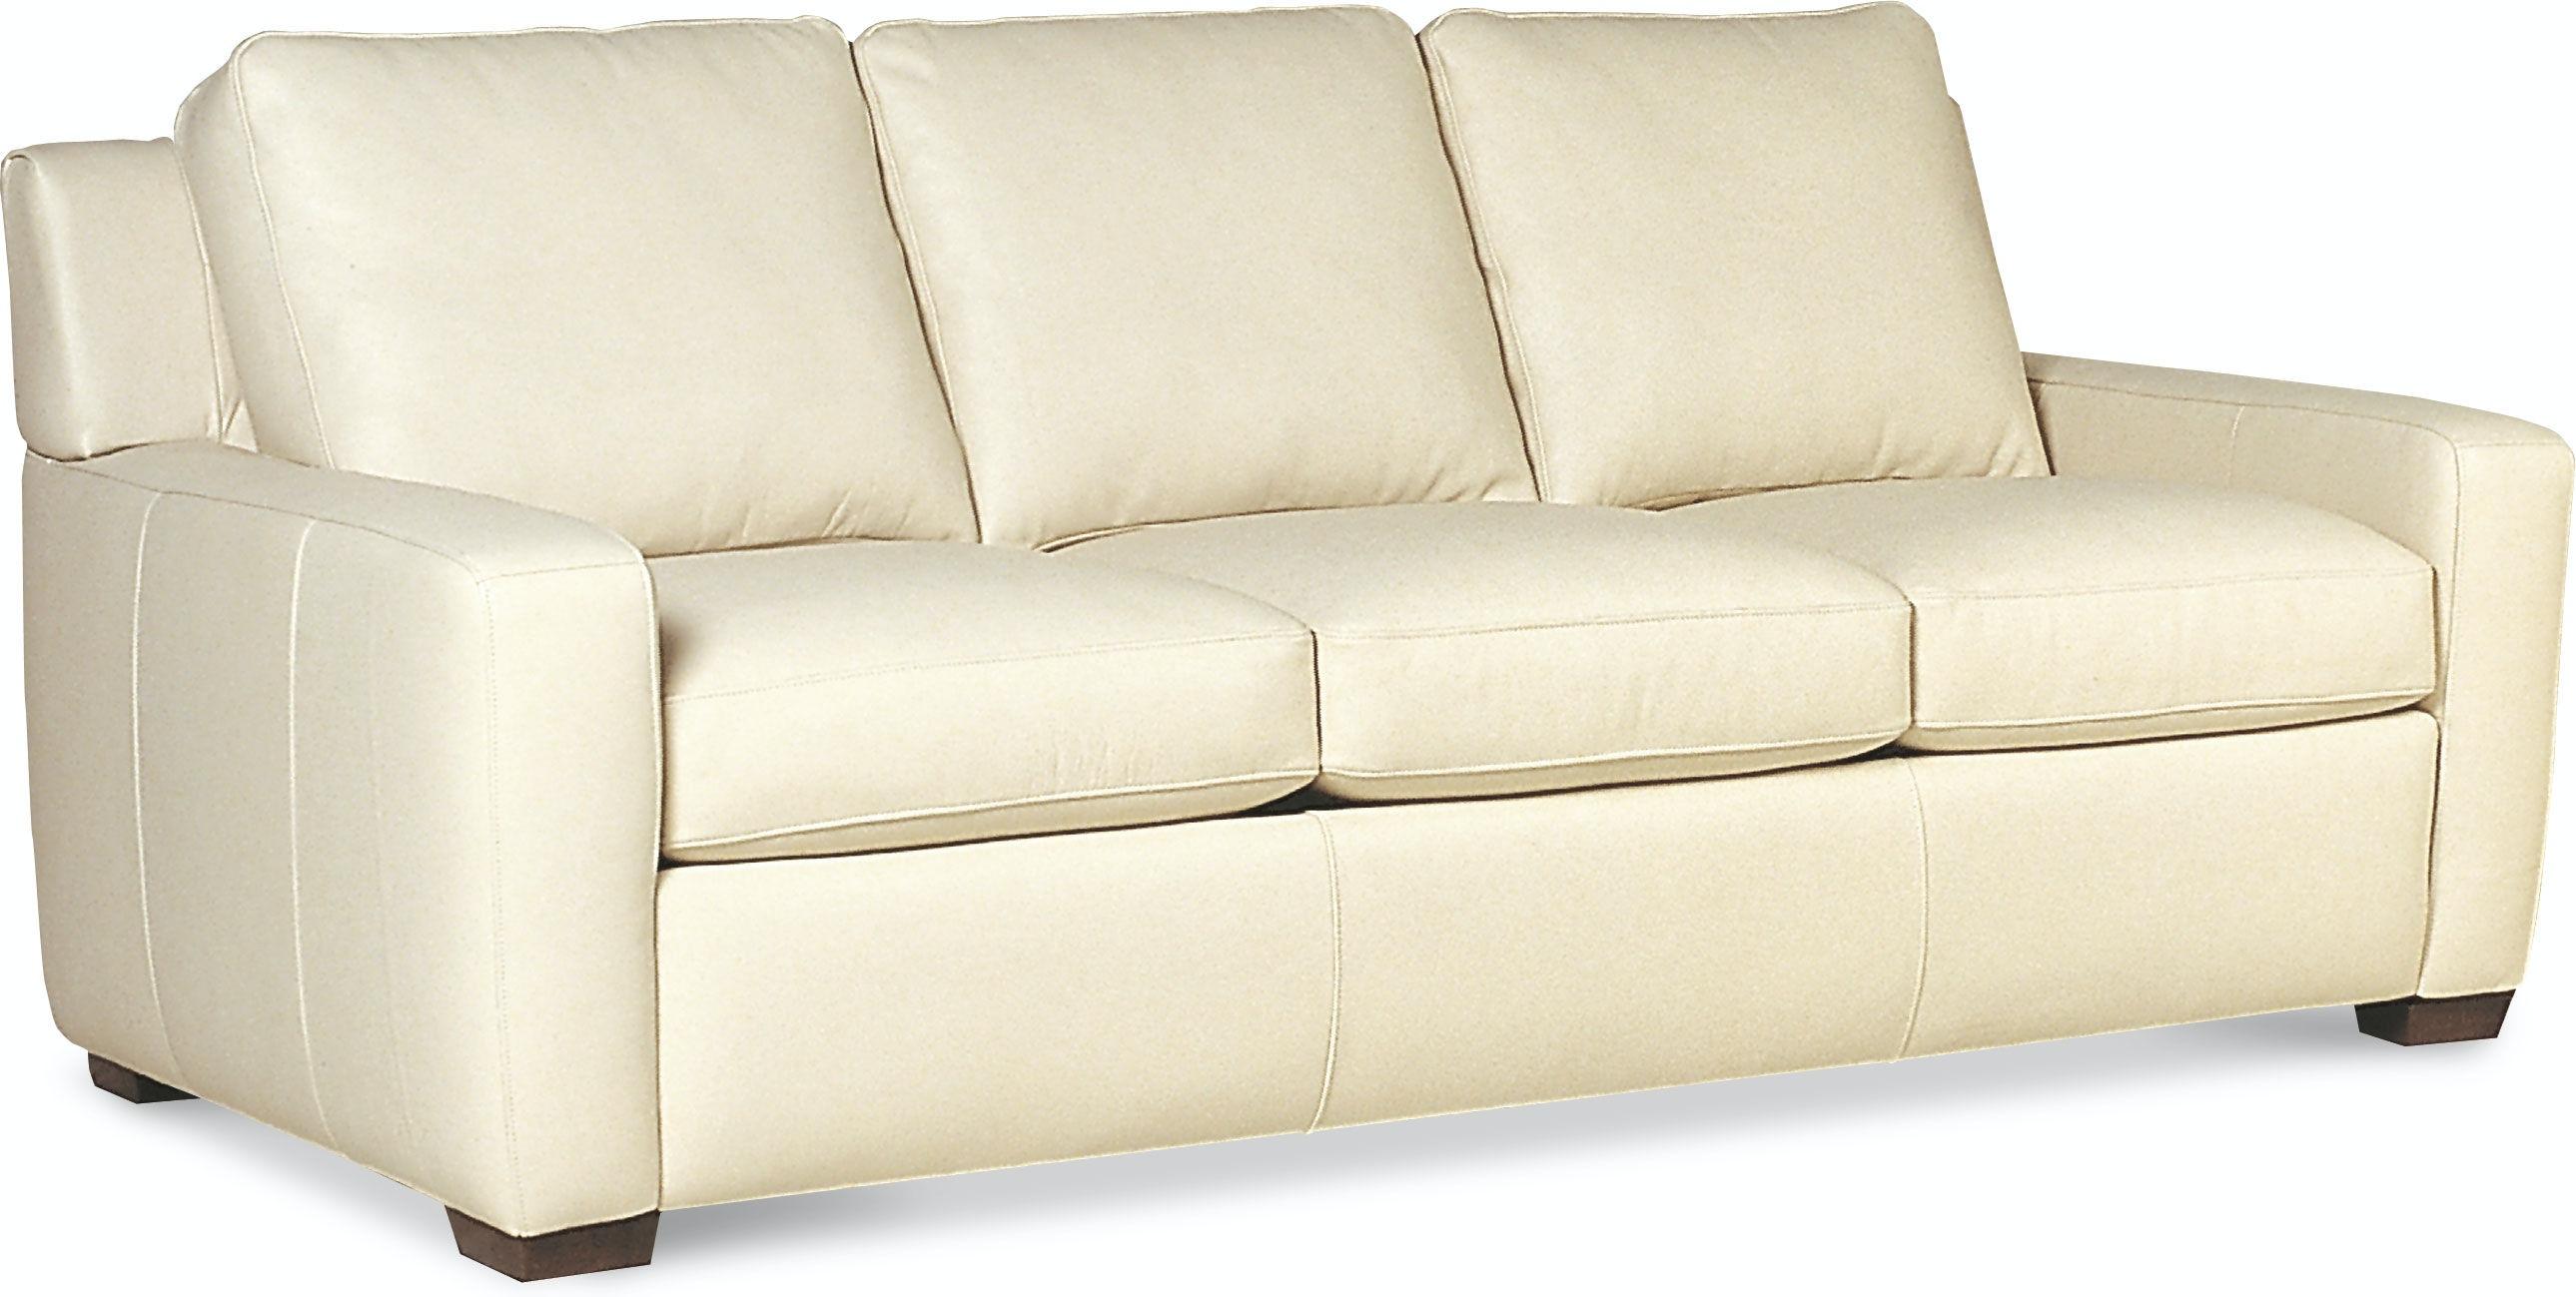 American Leather Three Cushion Sofa LIS SO3 ST